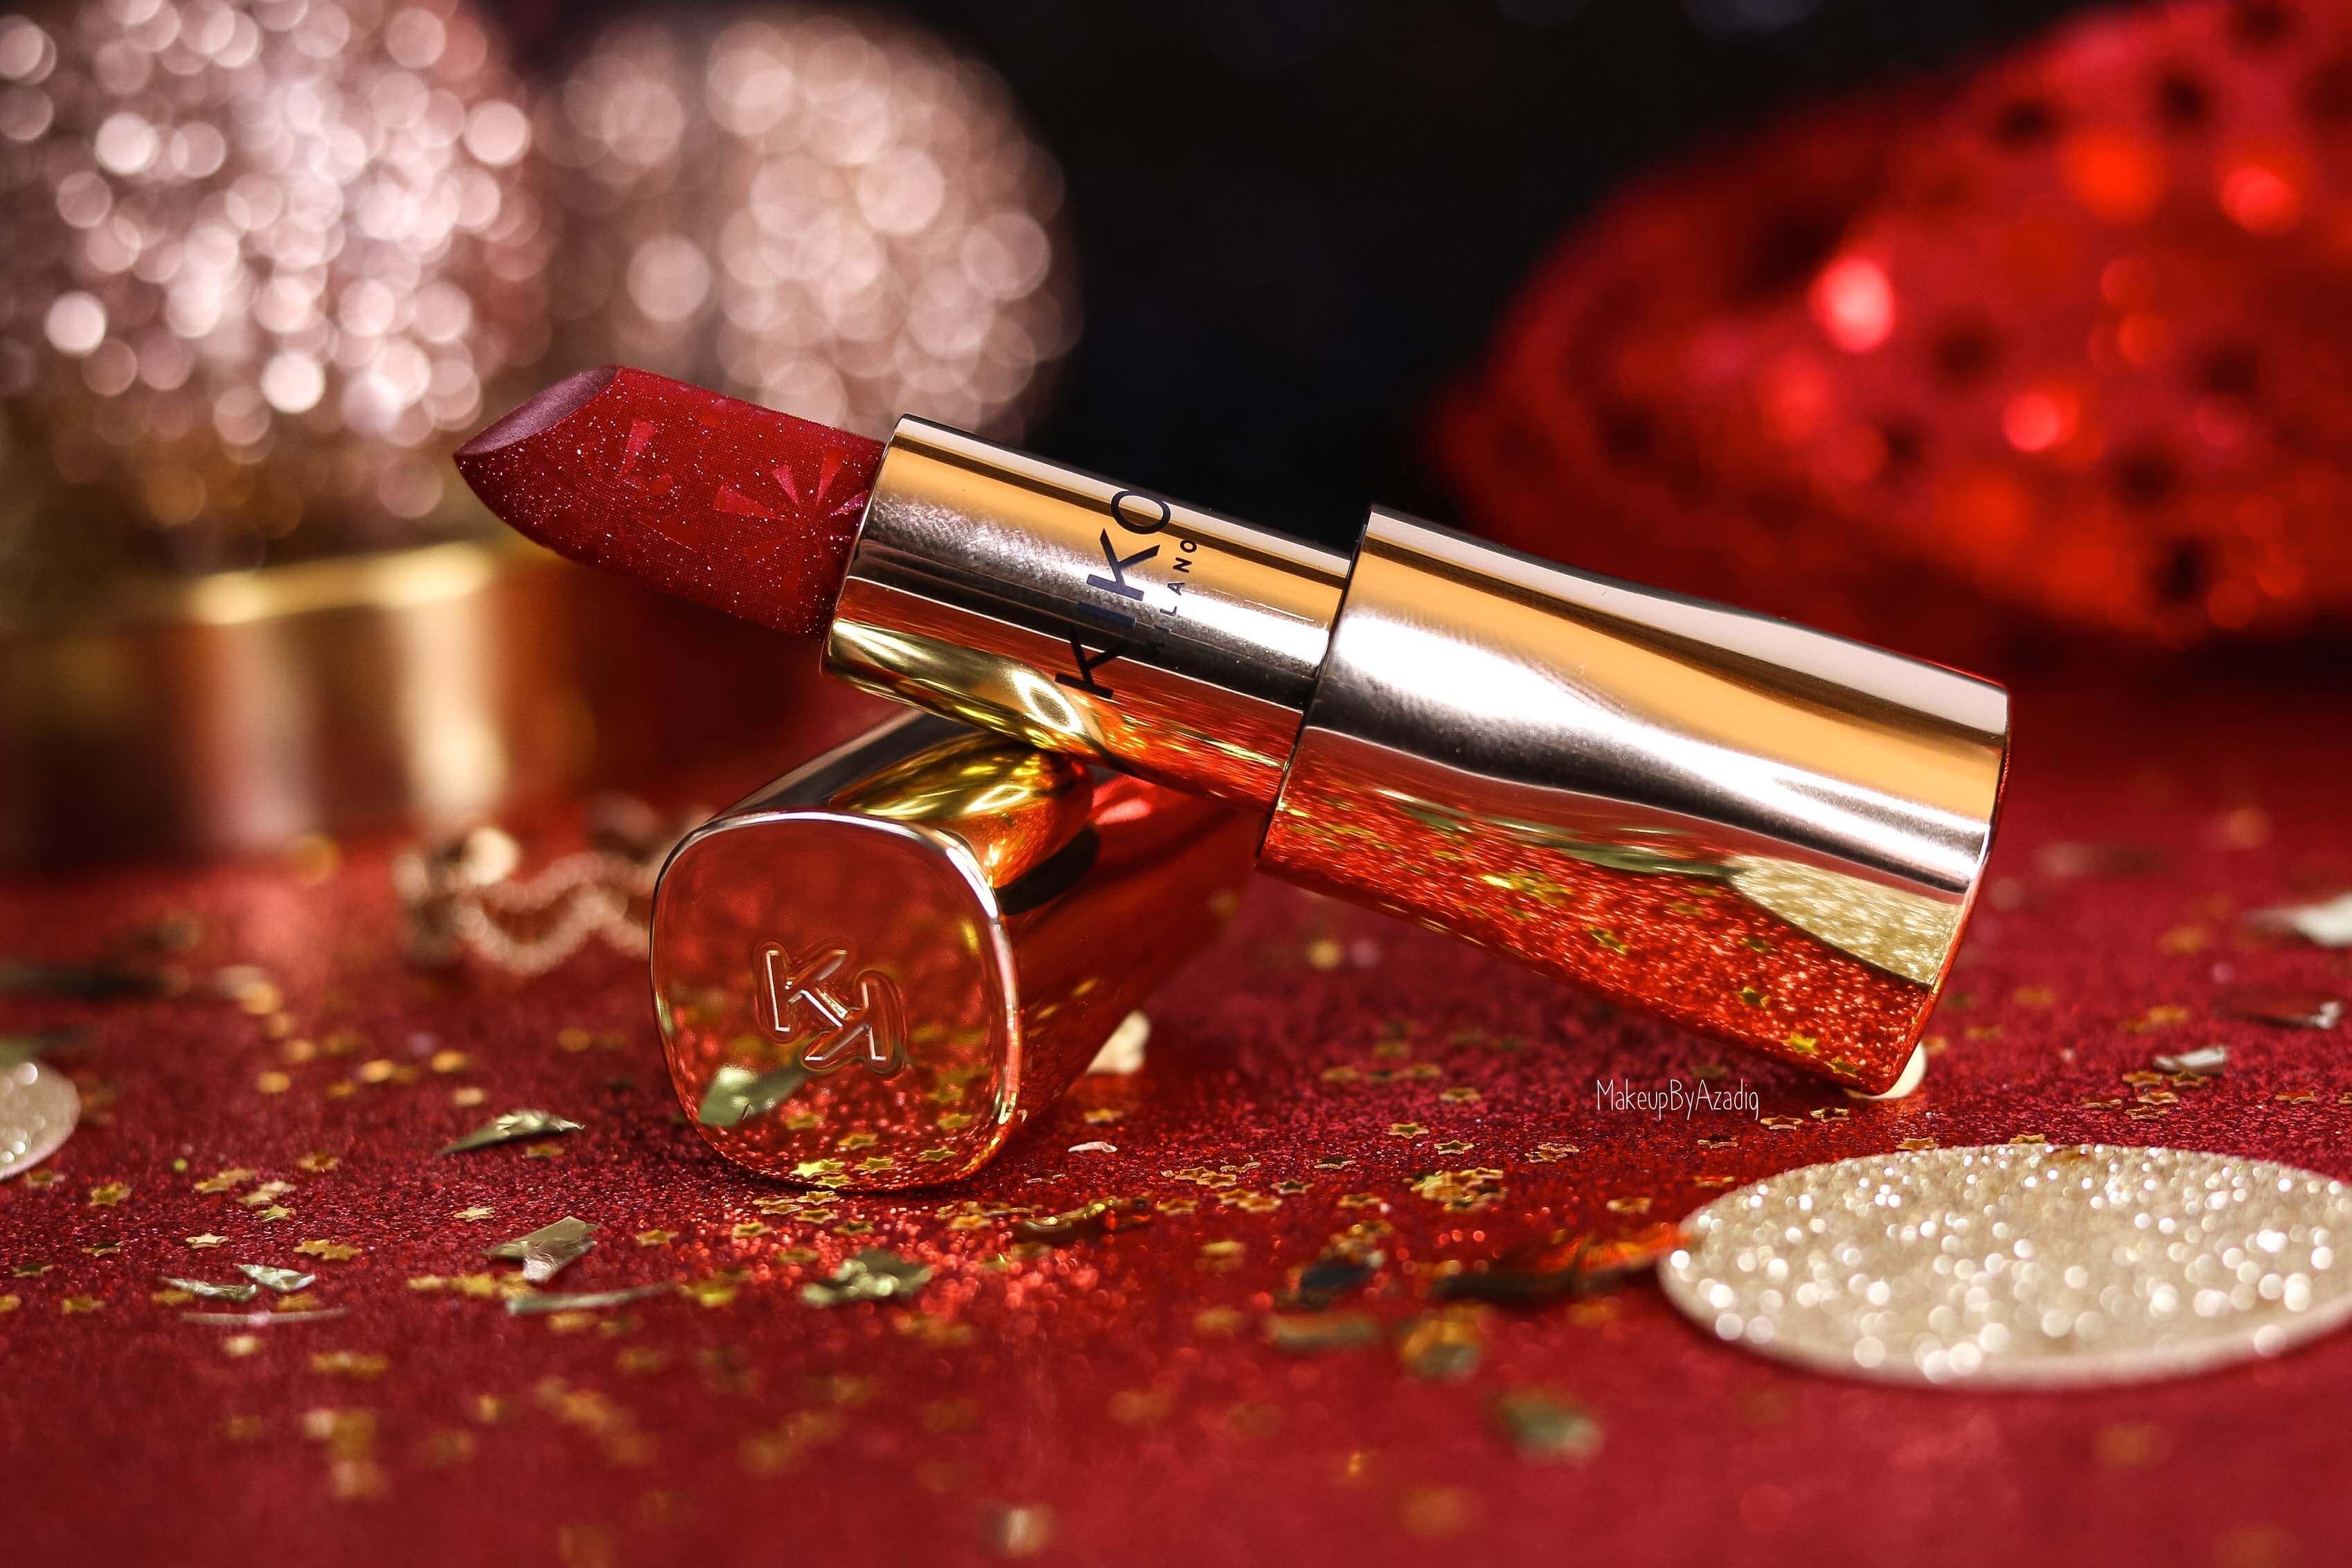 revue-collection-noel-kiko-milano-troyes-magical-holiday-rouge-levres-fard-paupieres-makeupbyazadig-avis-prix-swatch-paillete-2019-best